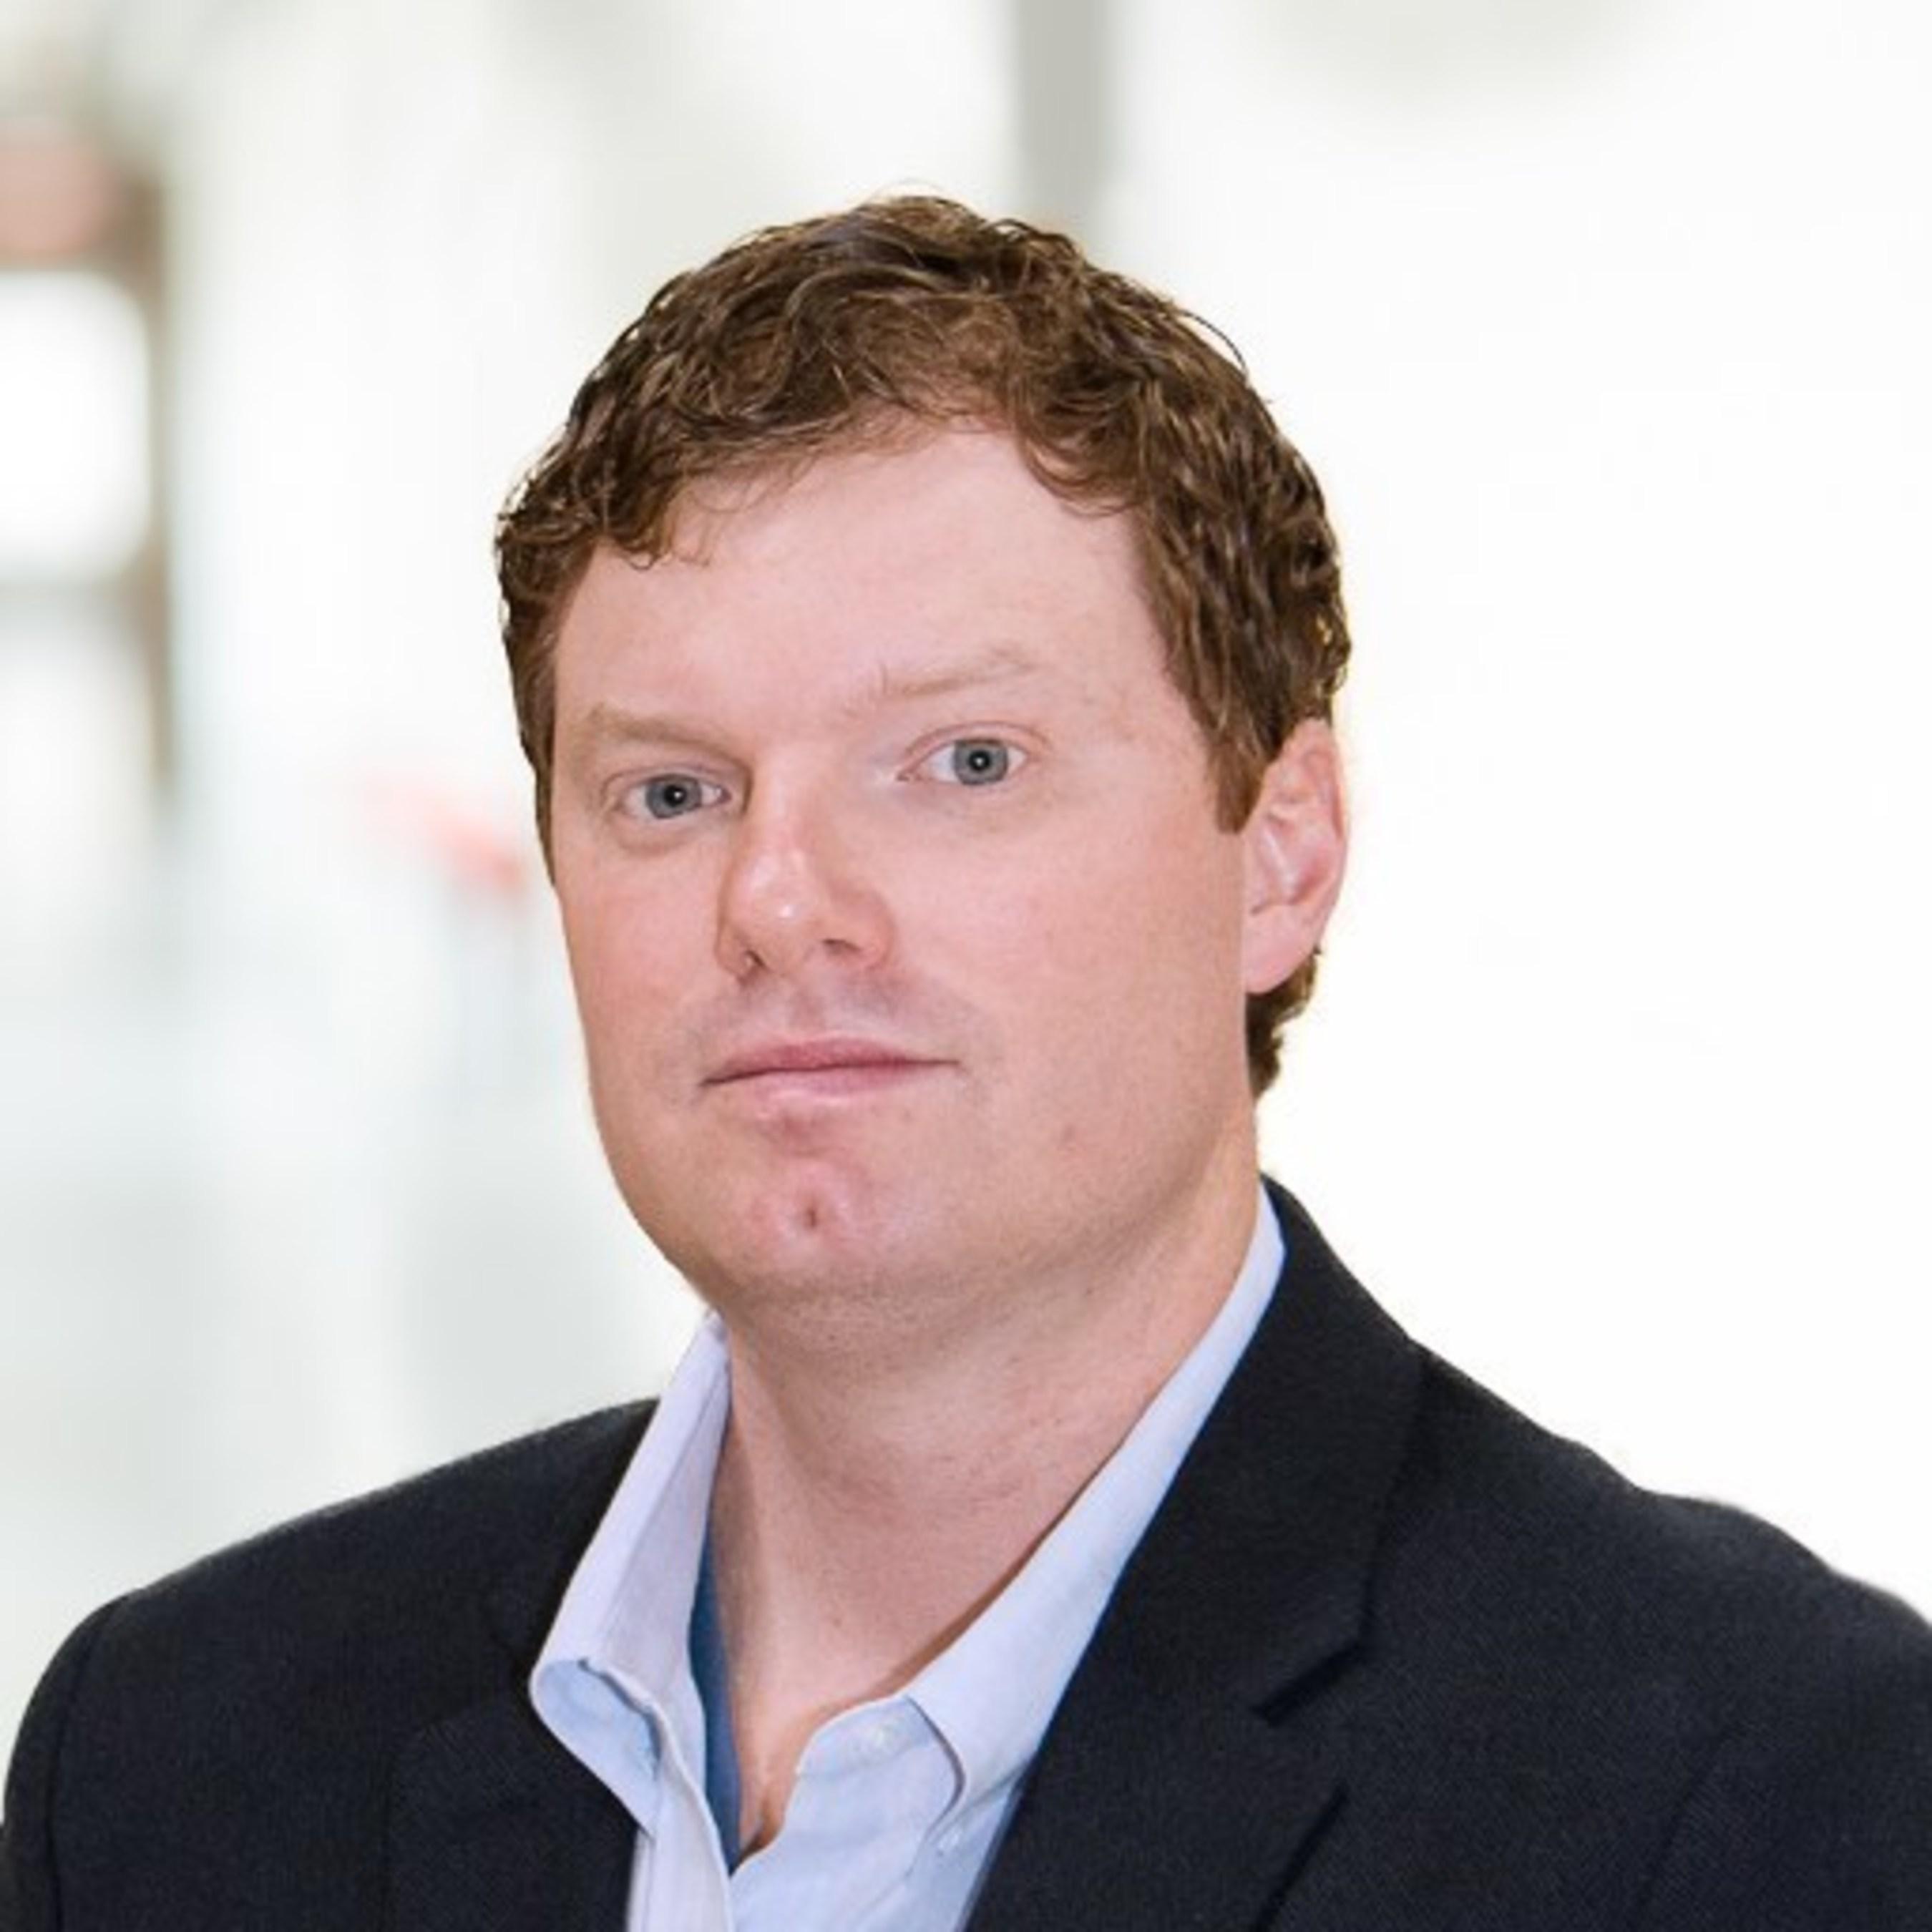 Chris Lynch, Cision Chief Marketing Officer